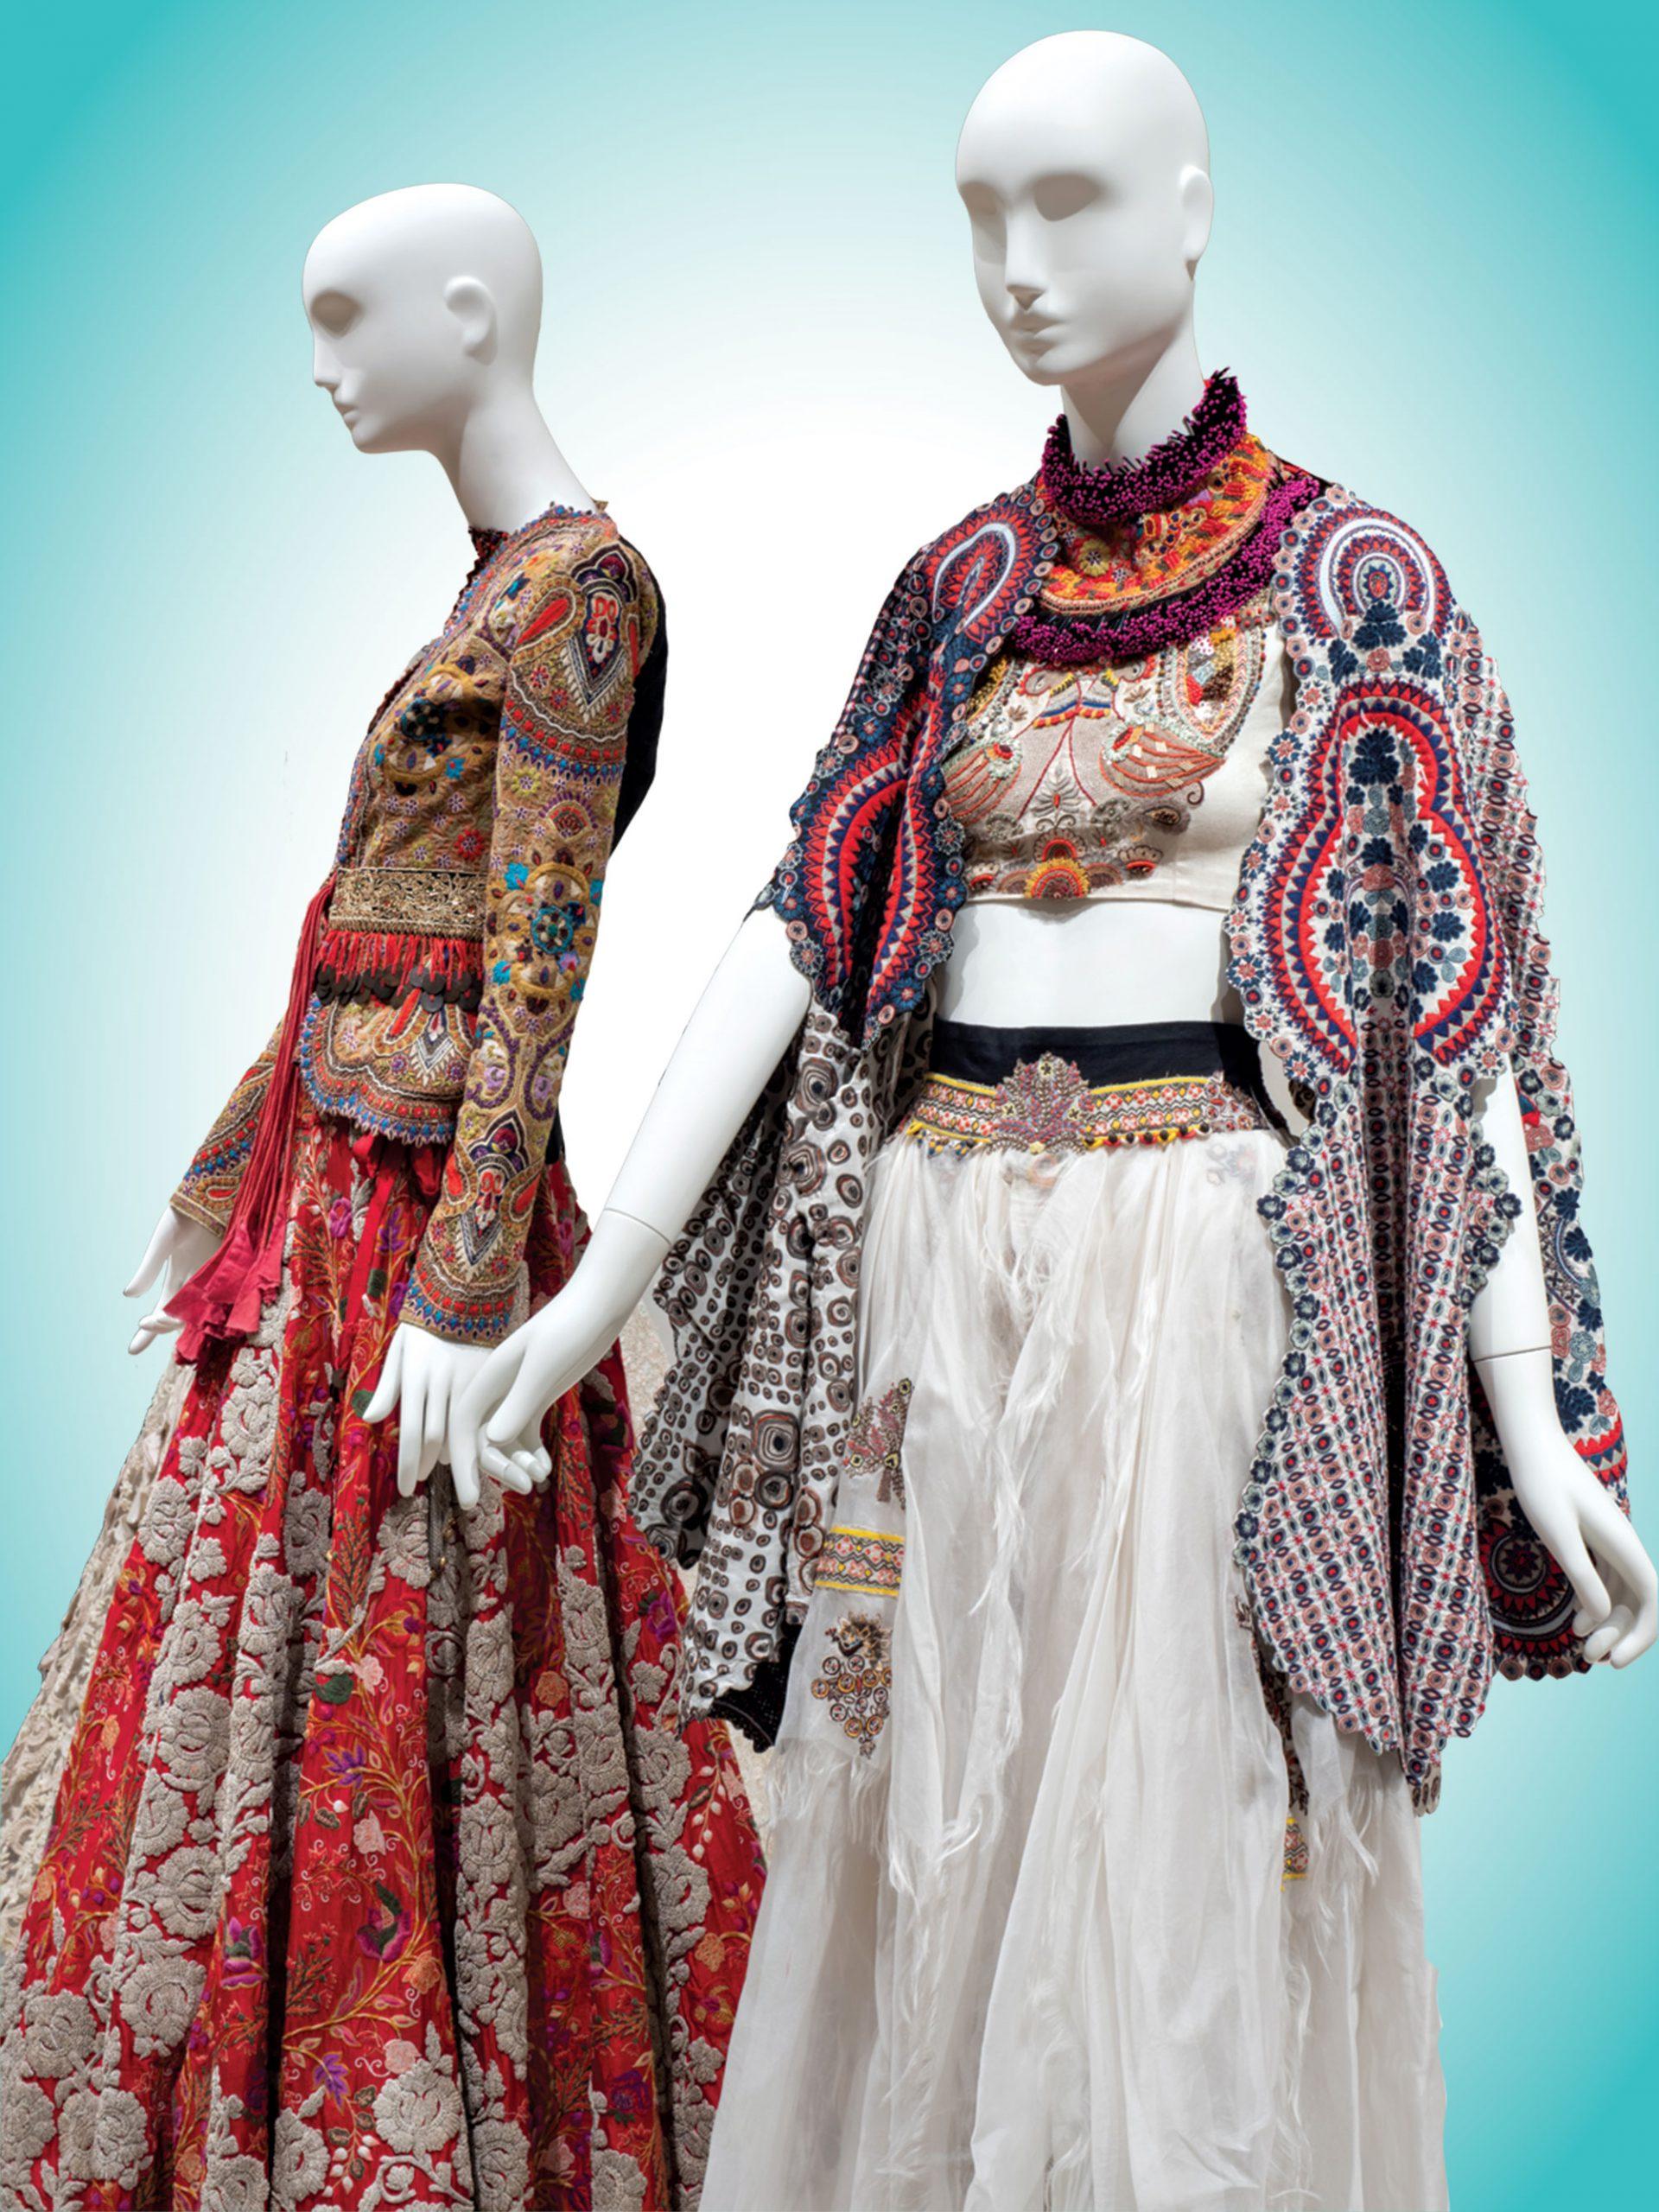 Installation view, India: Fashion's Muse, 2020, Phoenix Art Museum; Photo courtesy Phoenix Art Museum